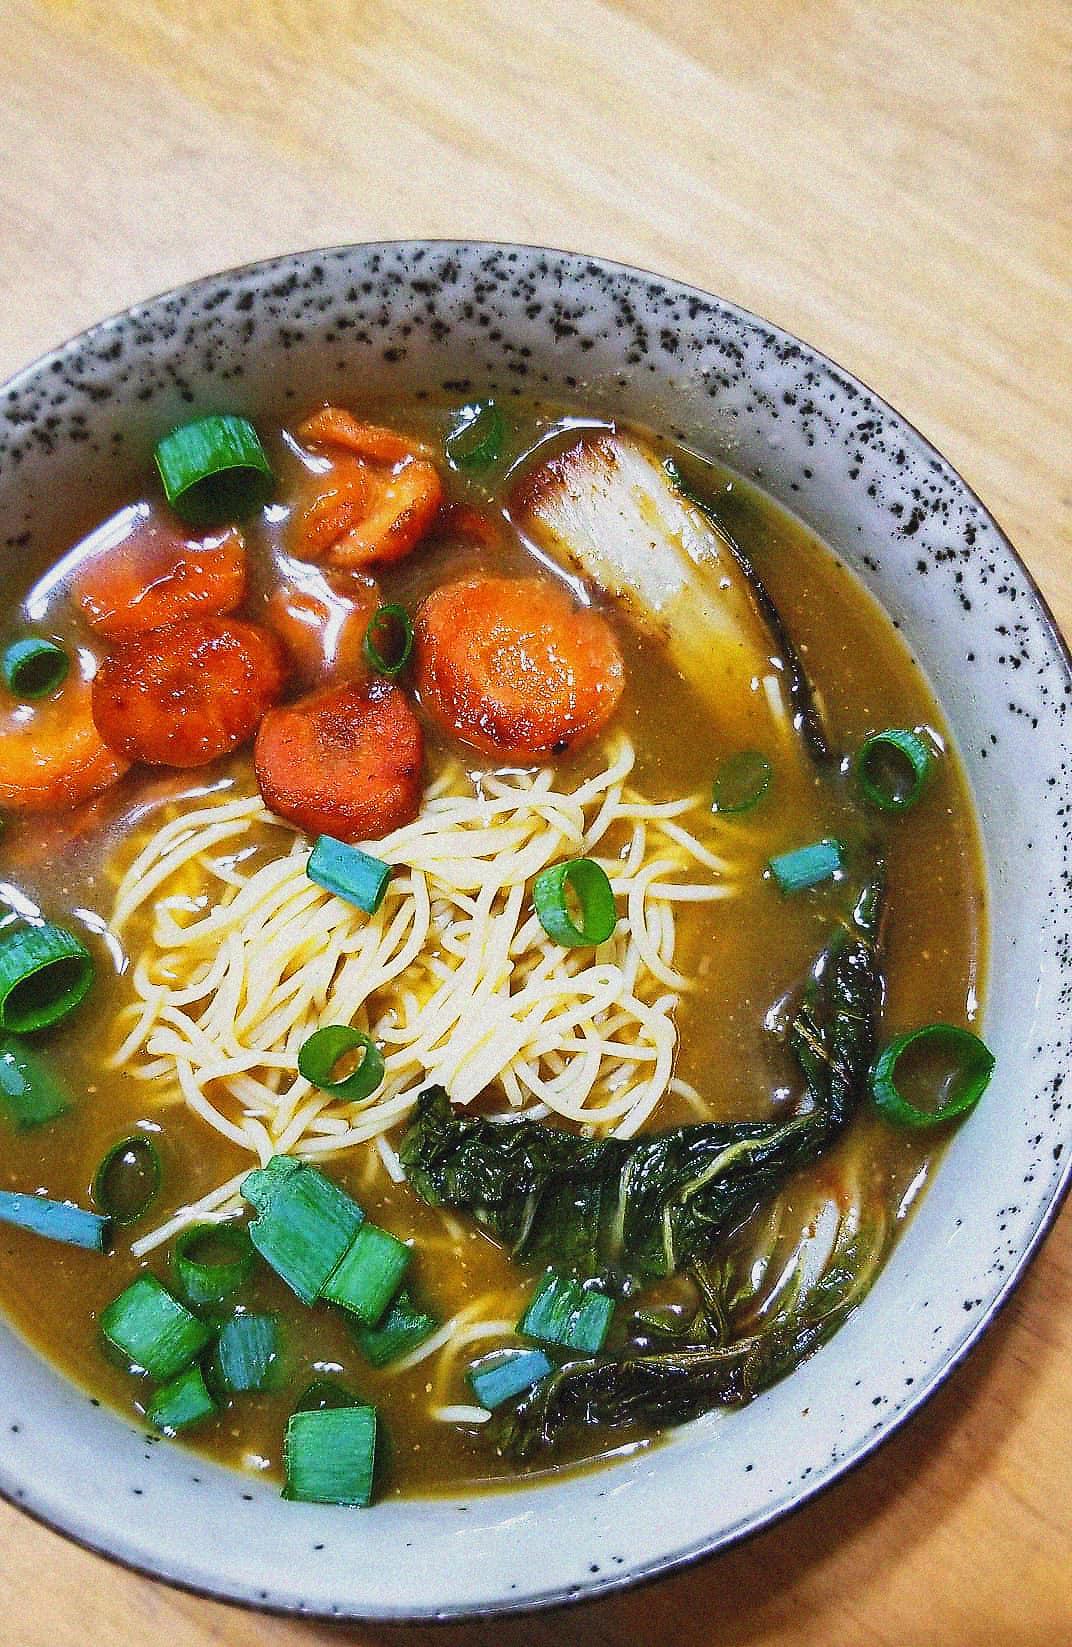 Vegan Ramen with caramelized veggies